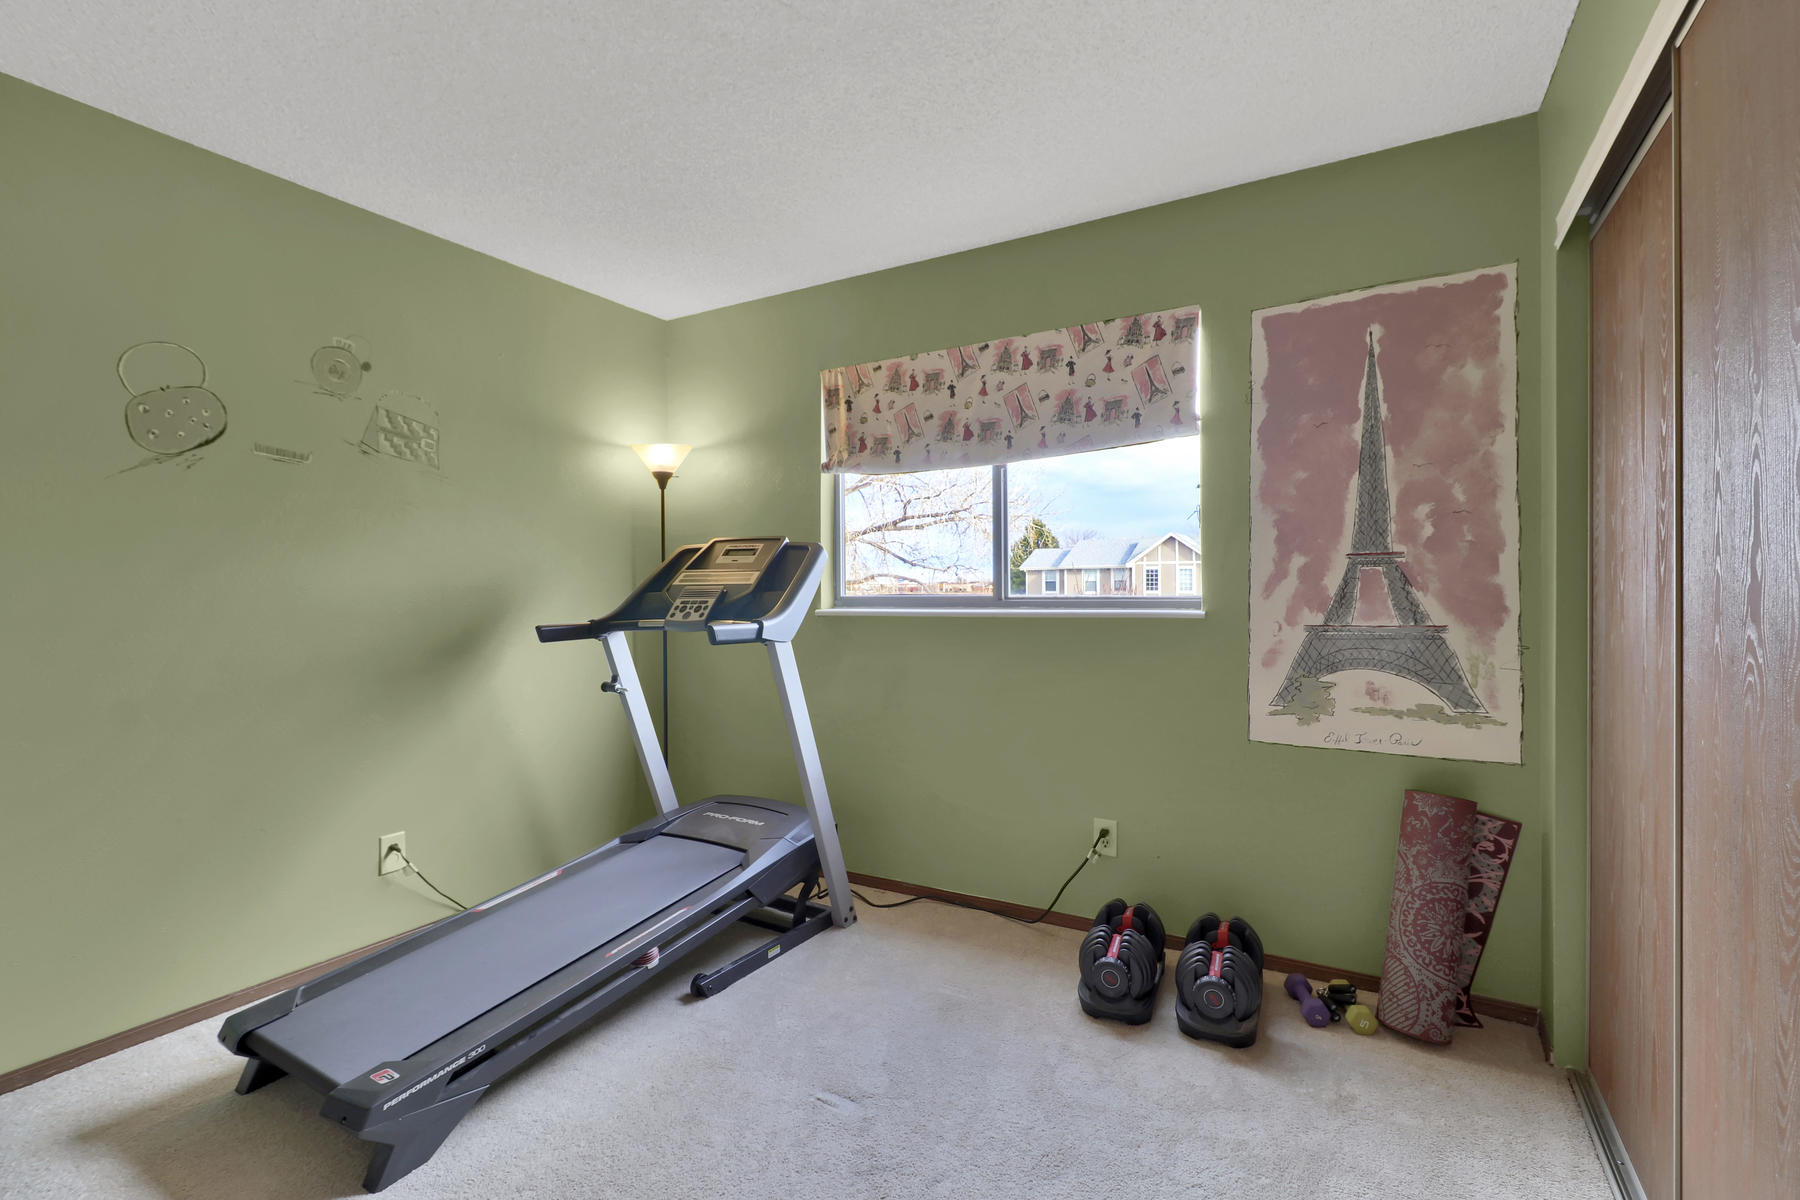 990 W 133rd Cir E Westminster-020-25-Bedroom-MLS_Size.jpg